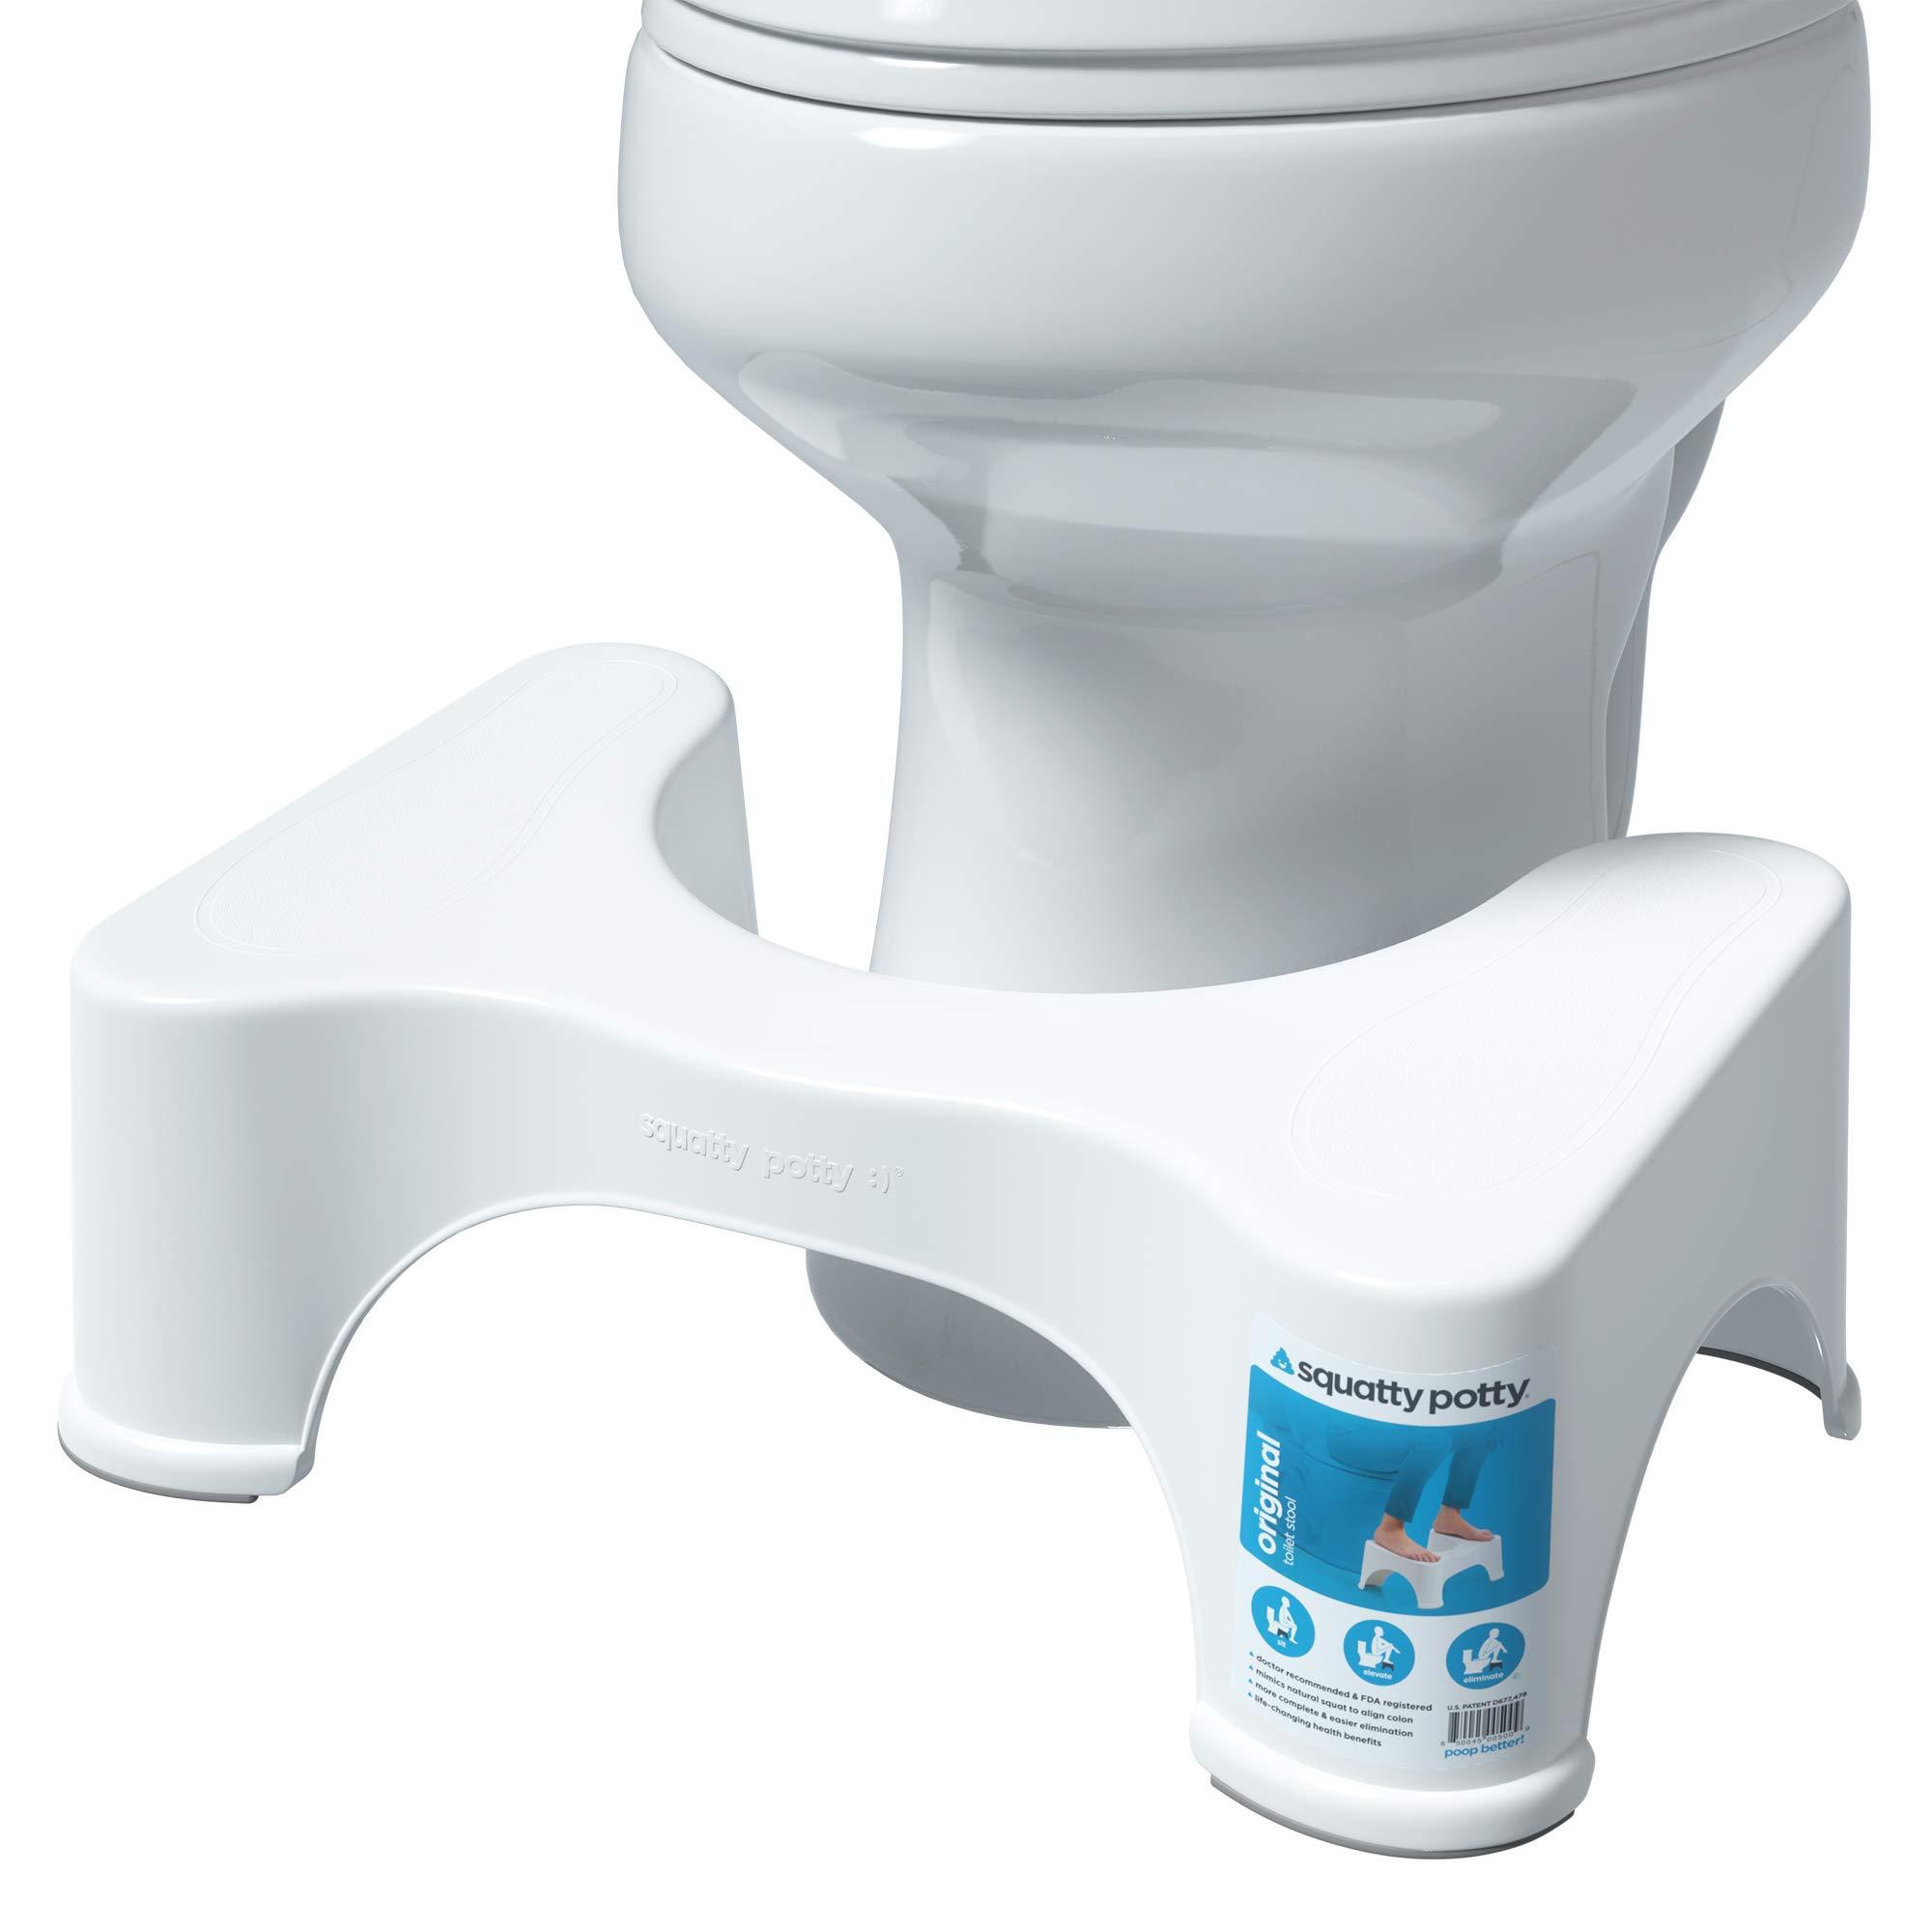 Squatty Potty The Original Bathroom Toilet Stool, 7 Inch height, White